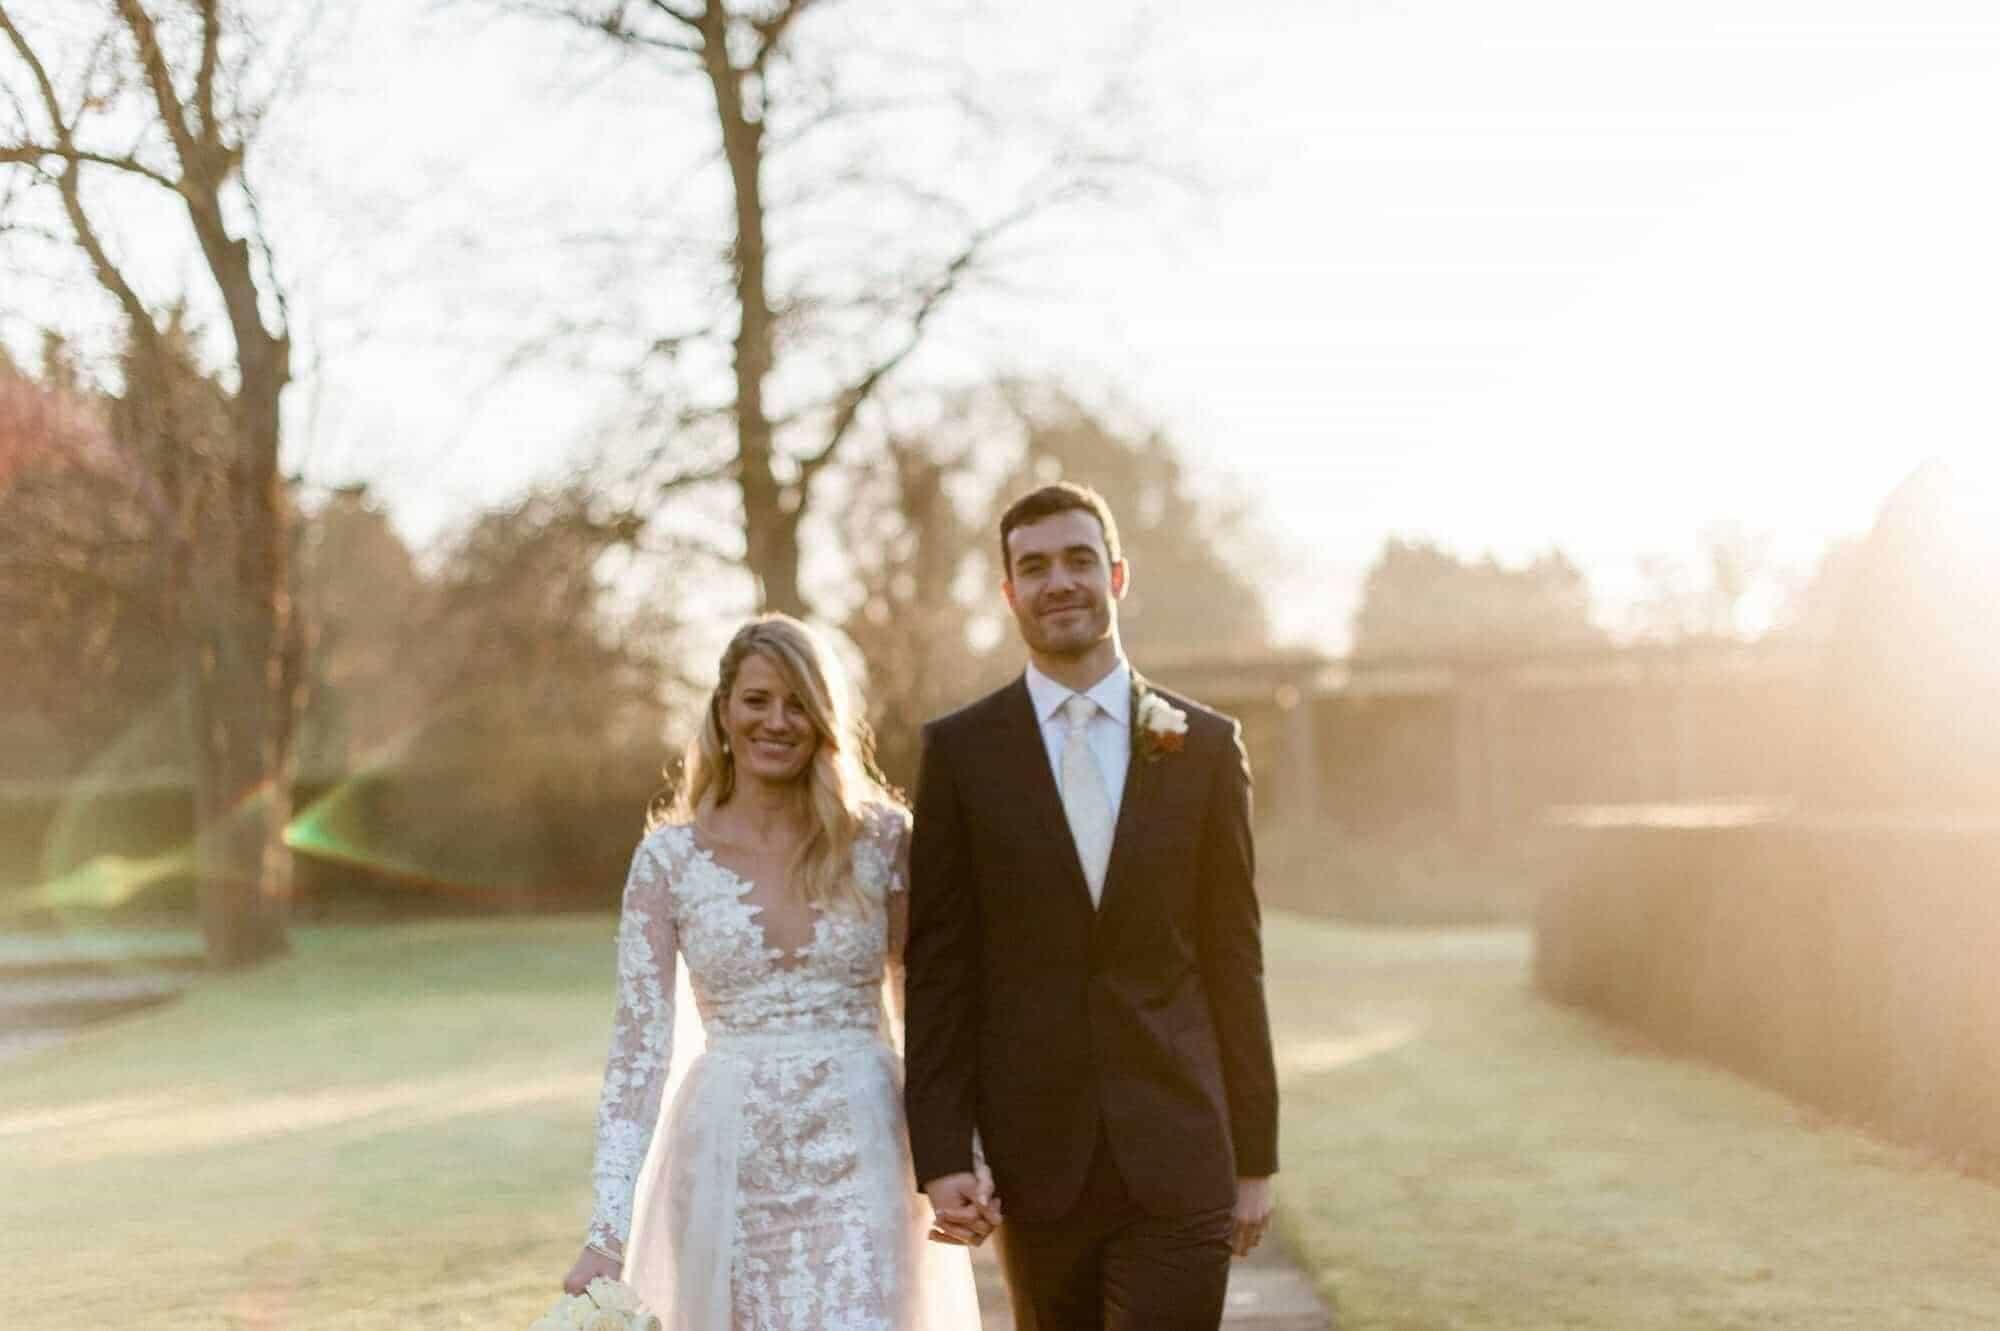 Kate Nielen Photography 202 - Luxury Wedding Gallery